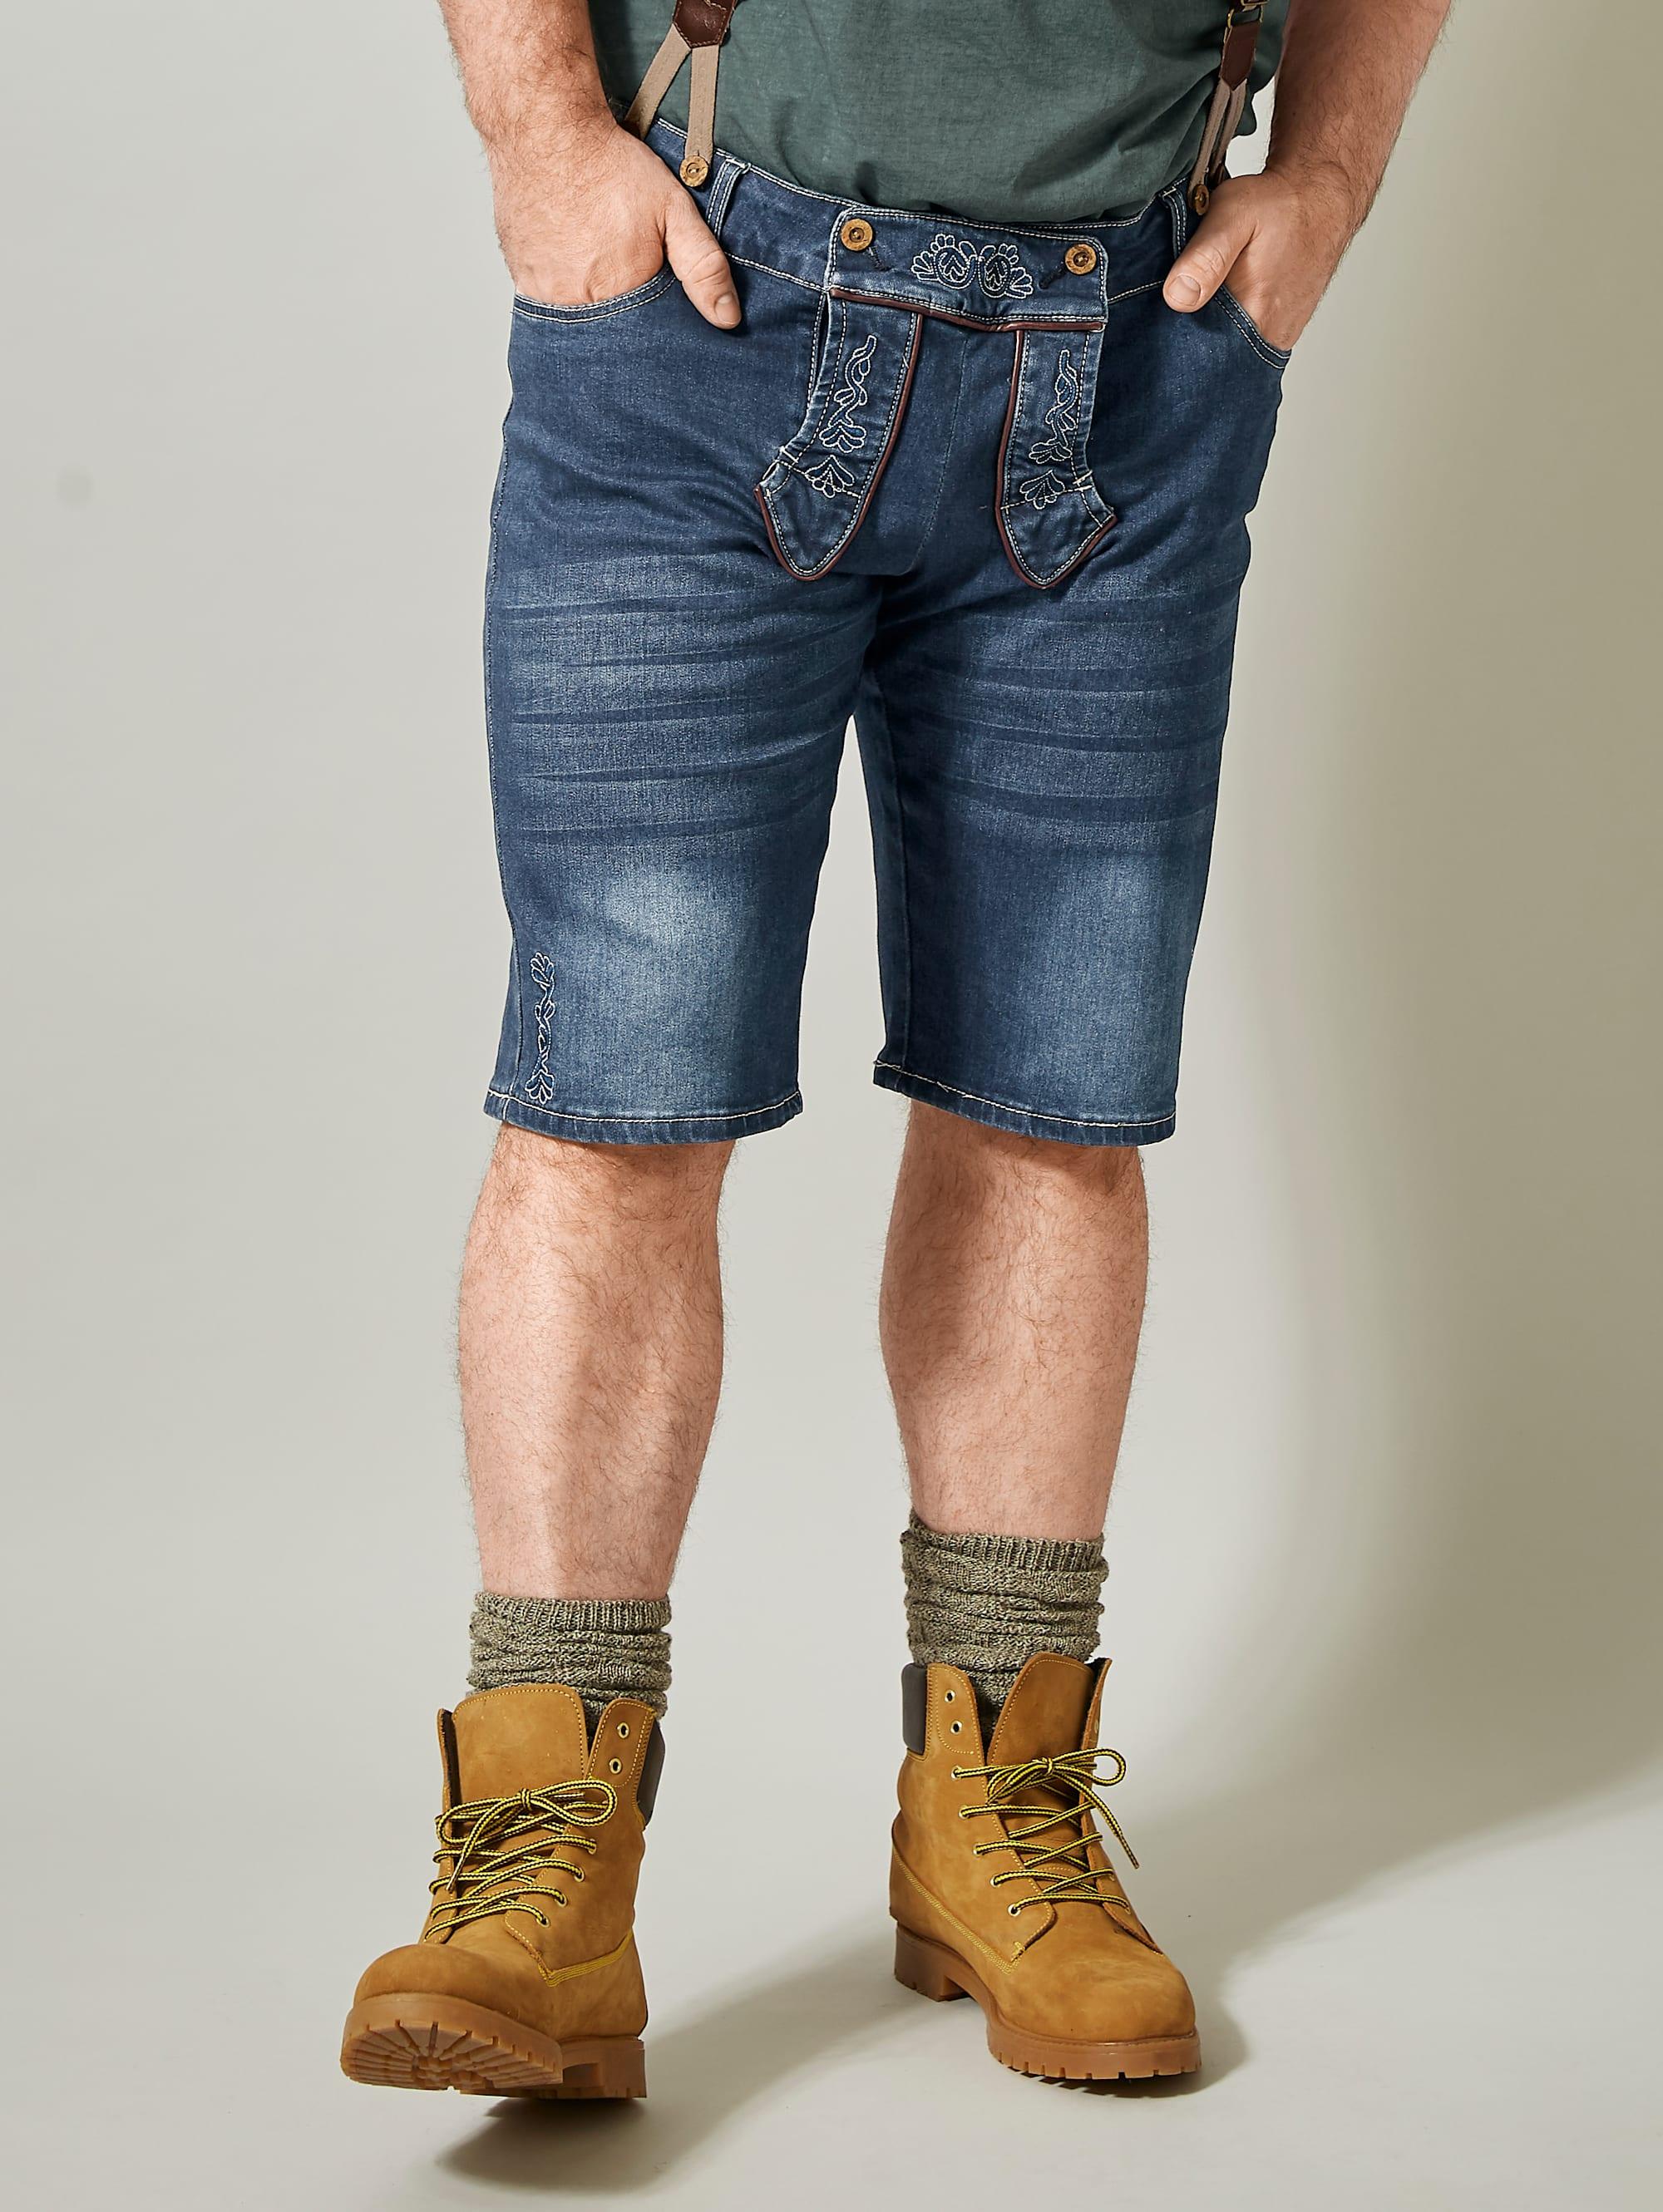 Men Plus by Happy Size Jeansbermuda im Trachten-Look inkl. Hosenträger | Bekleidung > Shorts & Bermudas > Jeans Bermudas | Men Plus By Happy Size